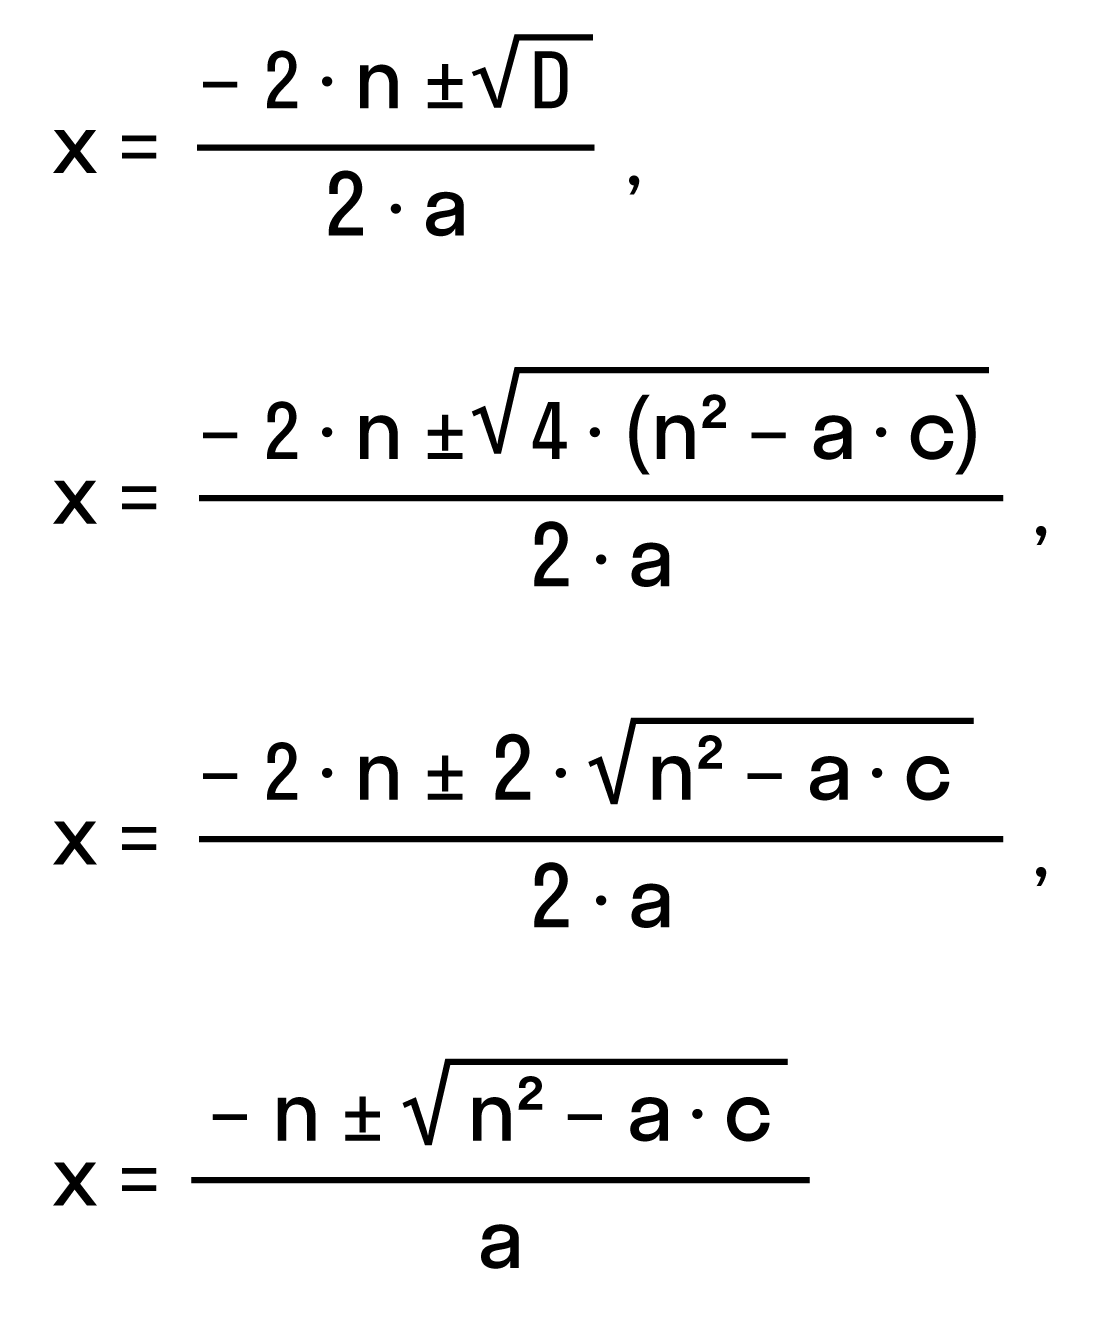 решение квадратного уравнения ax<sup>2</sup> + 2nx + c = 0